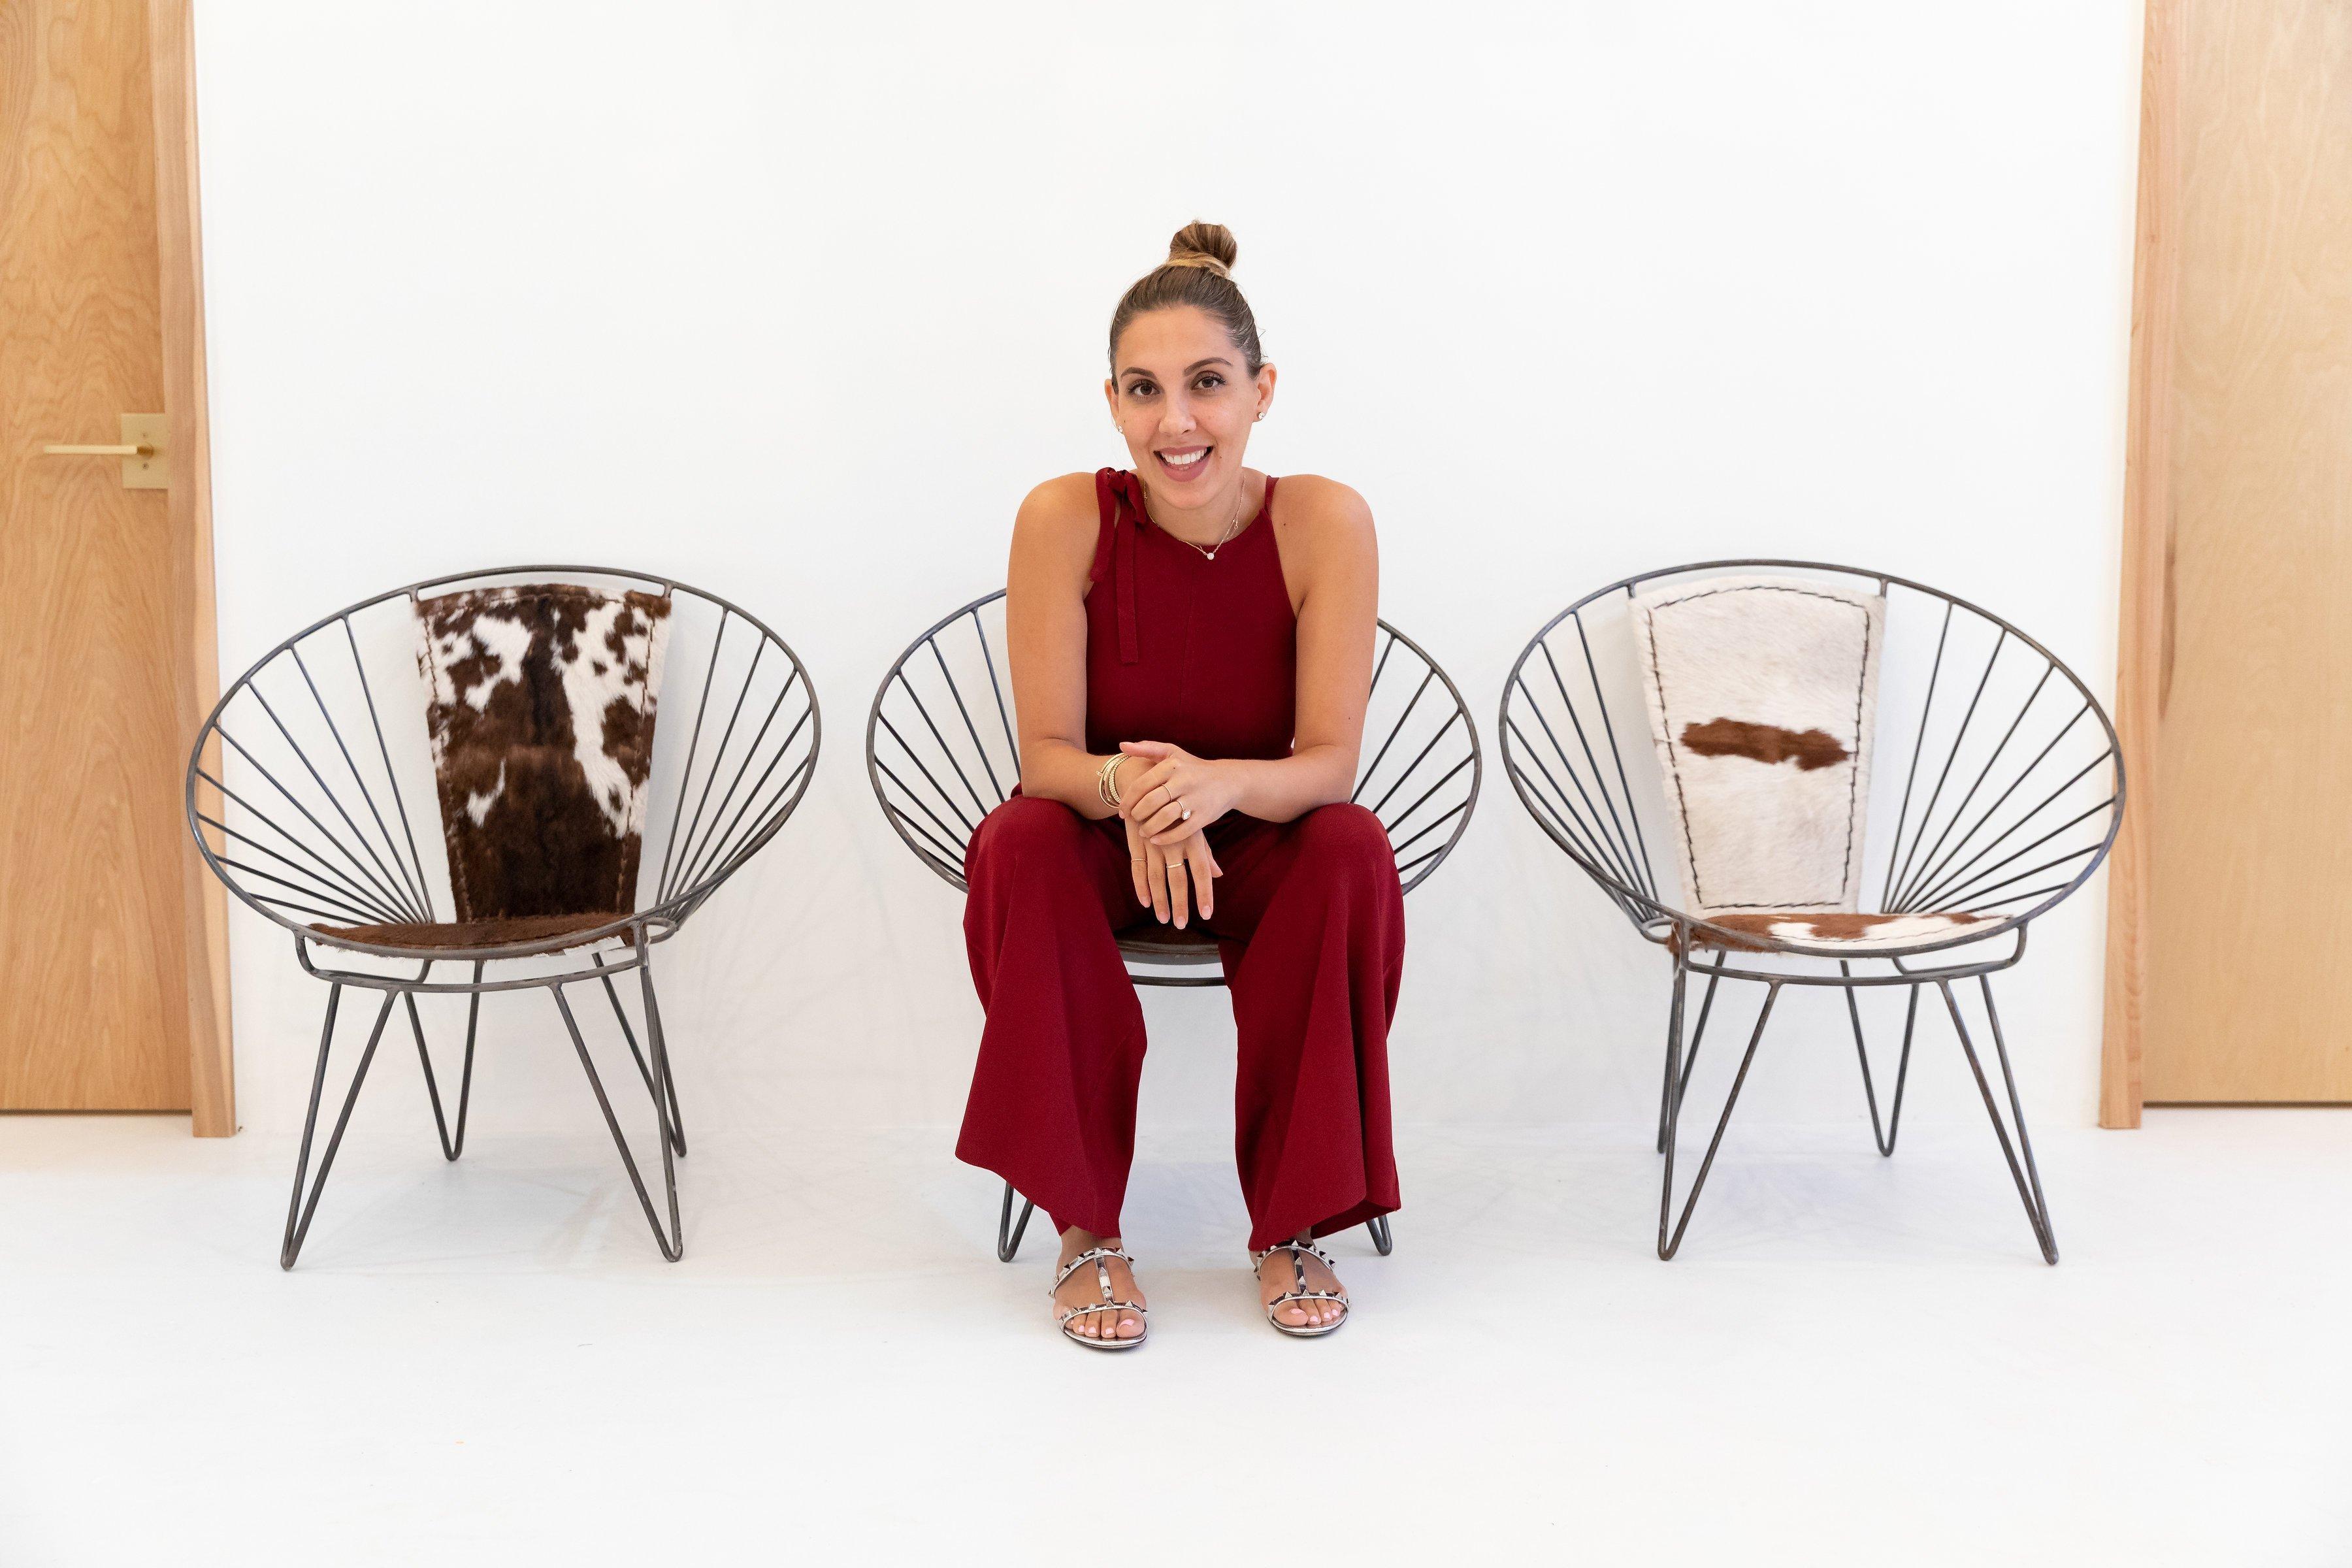 Vie Healing founder Mona Dan